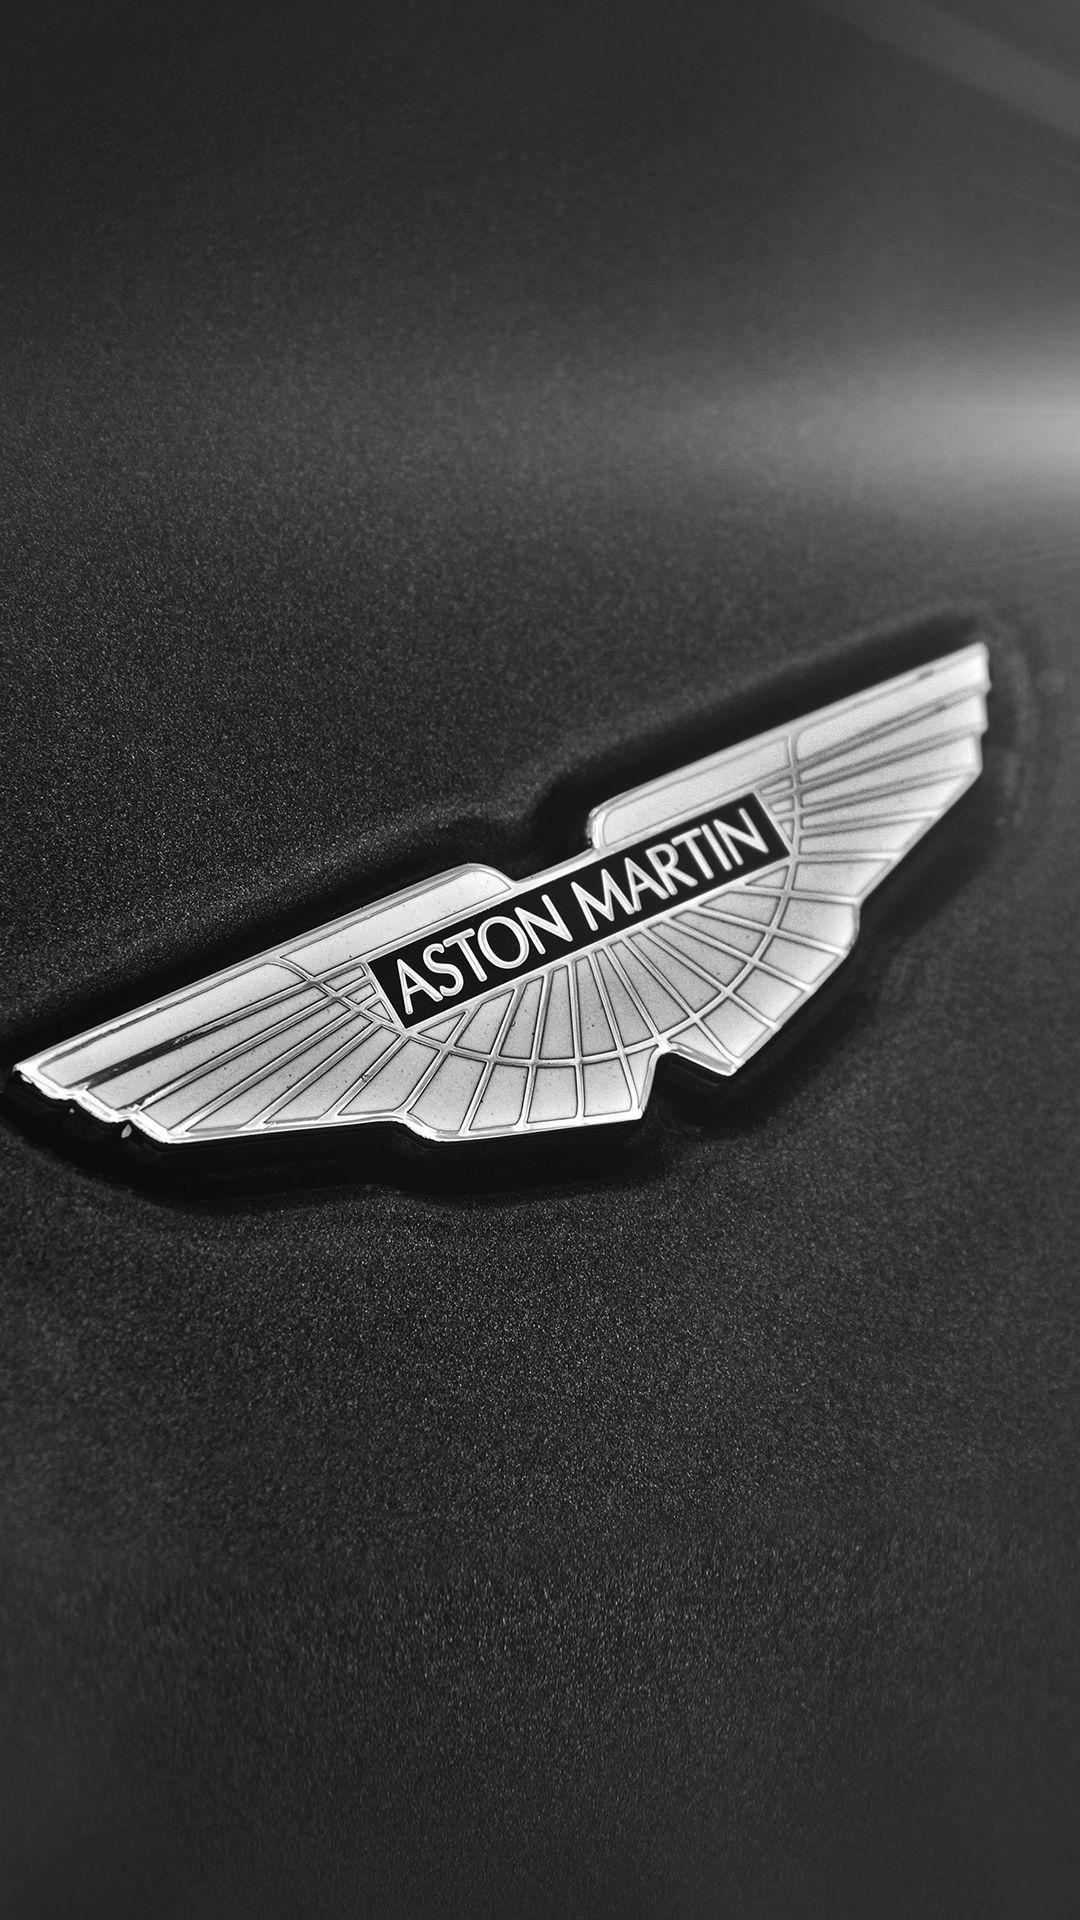 simple aston martin logo dark background iphone 6 wallpaper - Lamborghini Logo Wallpaper Iphone